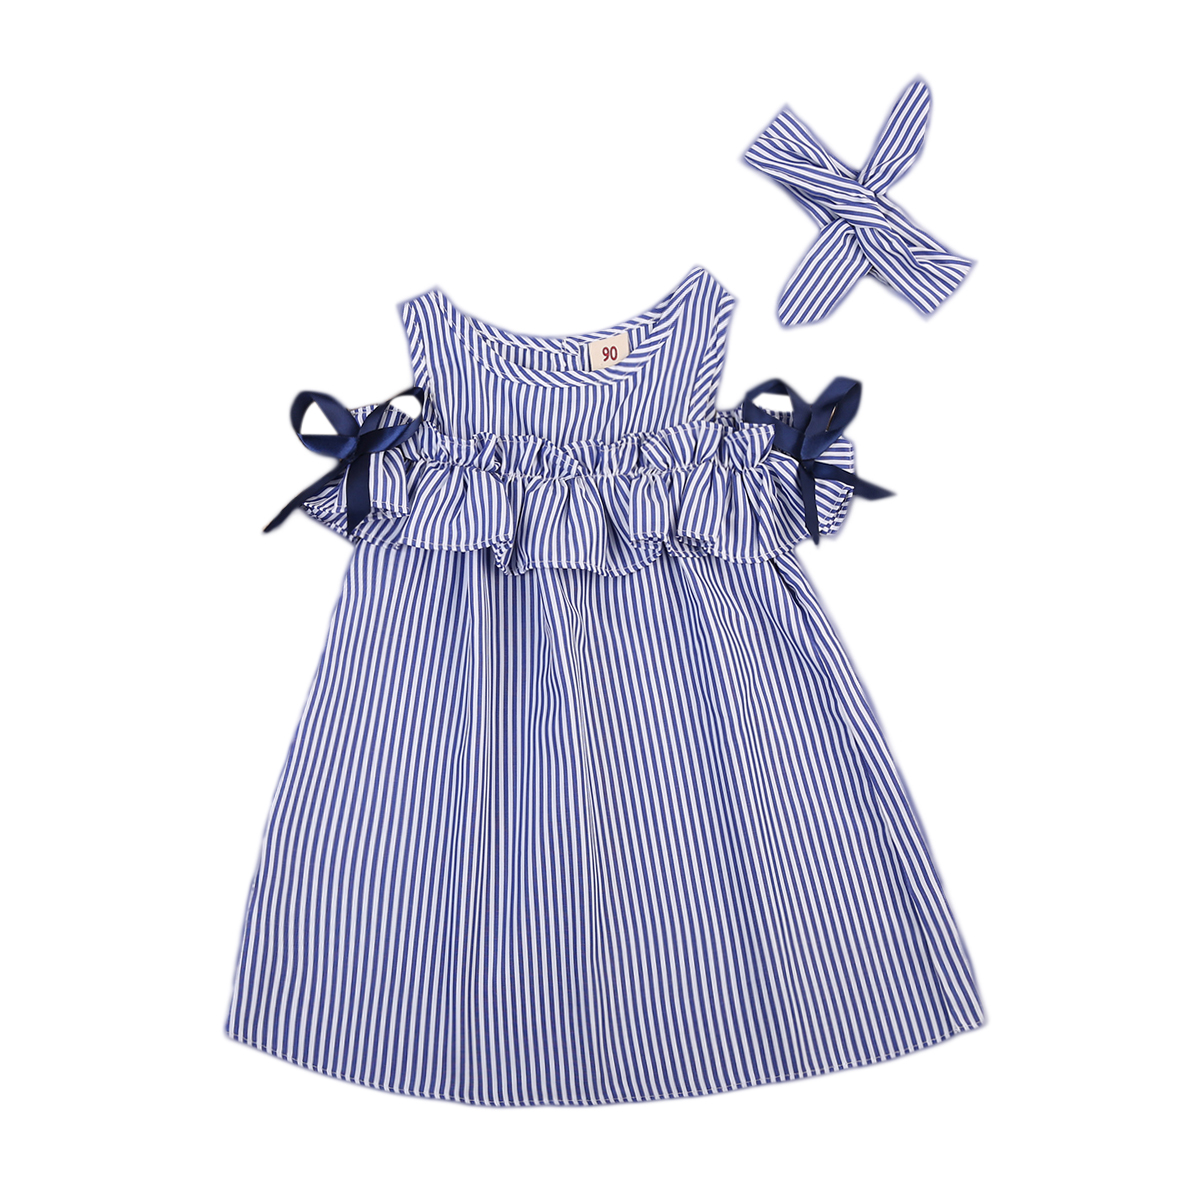 Blue Striped Dresses Fashion Kids font b Baby b font Girls Off Shoulder Floral Tops bowknot